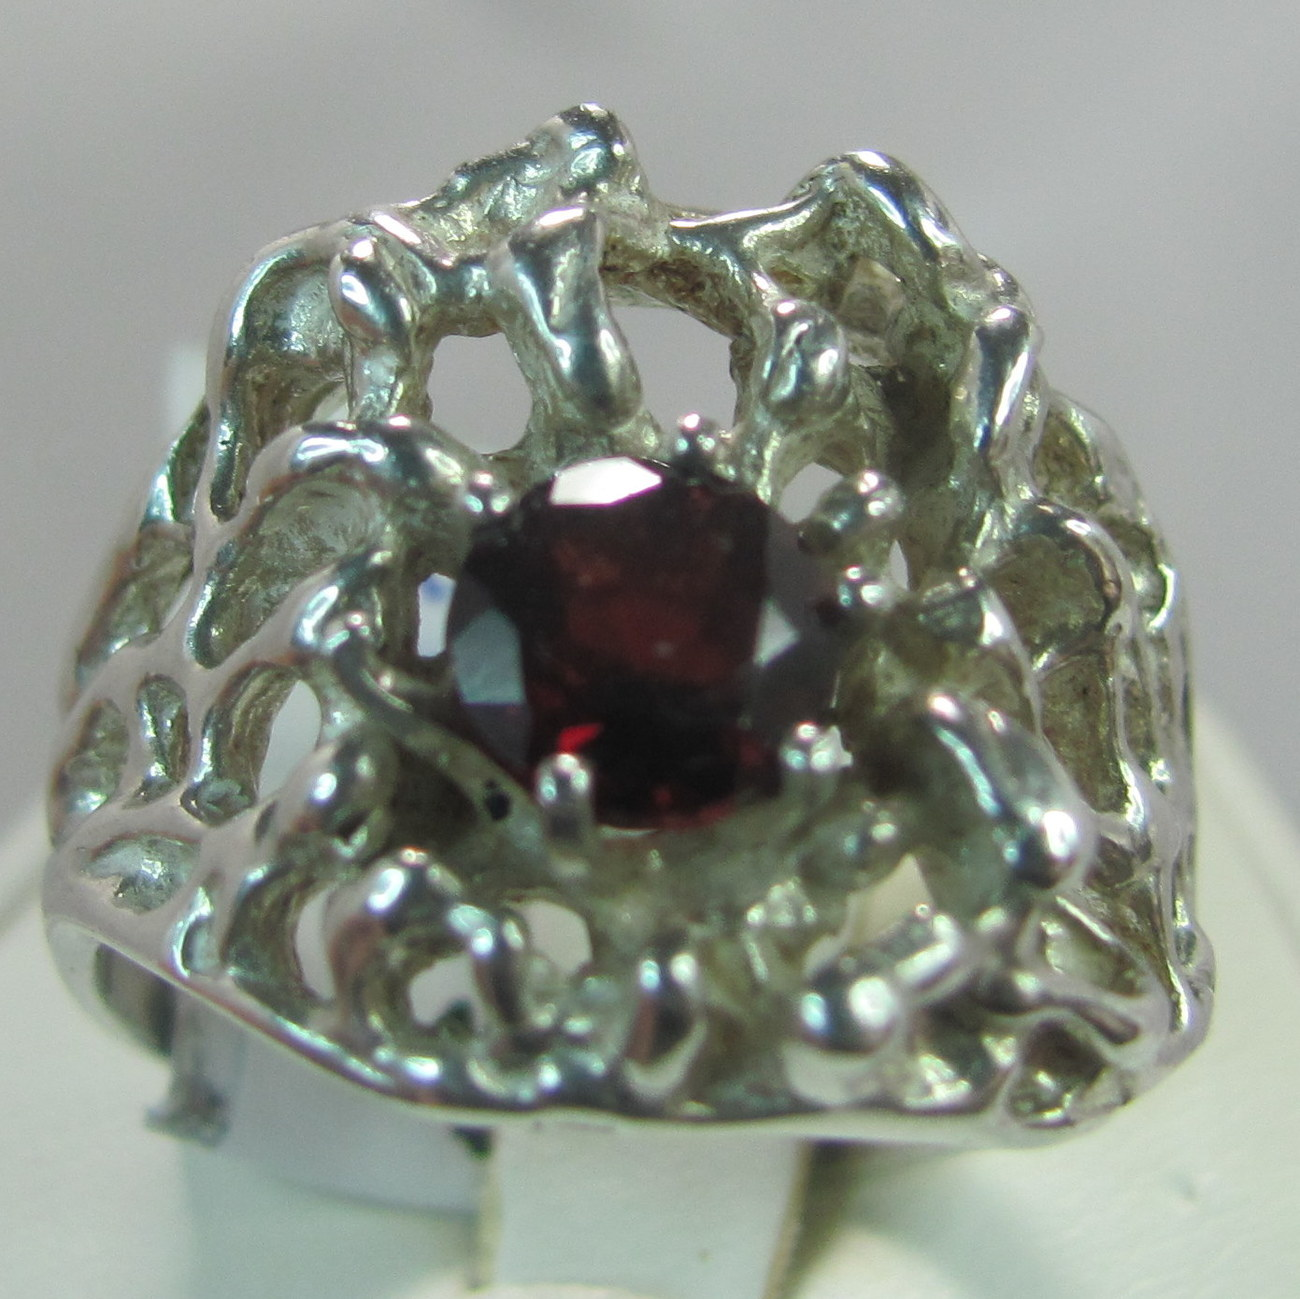 Garnet Gemstone 6mm round mens freeform siize 9 Sterling Silver ring  Bonanza